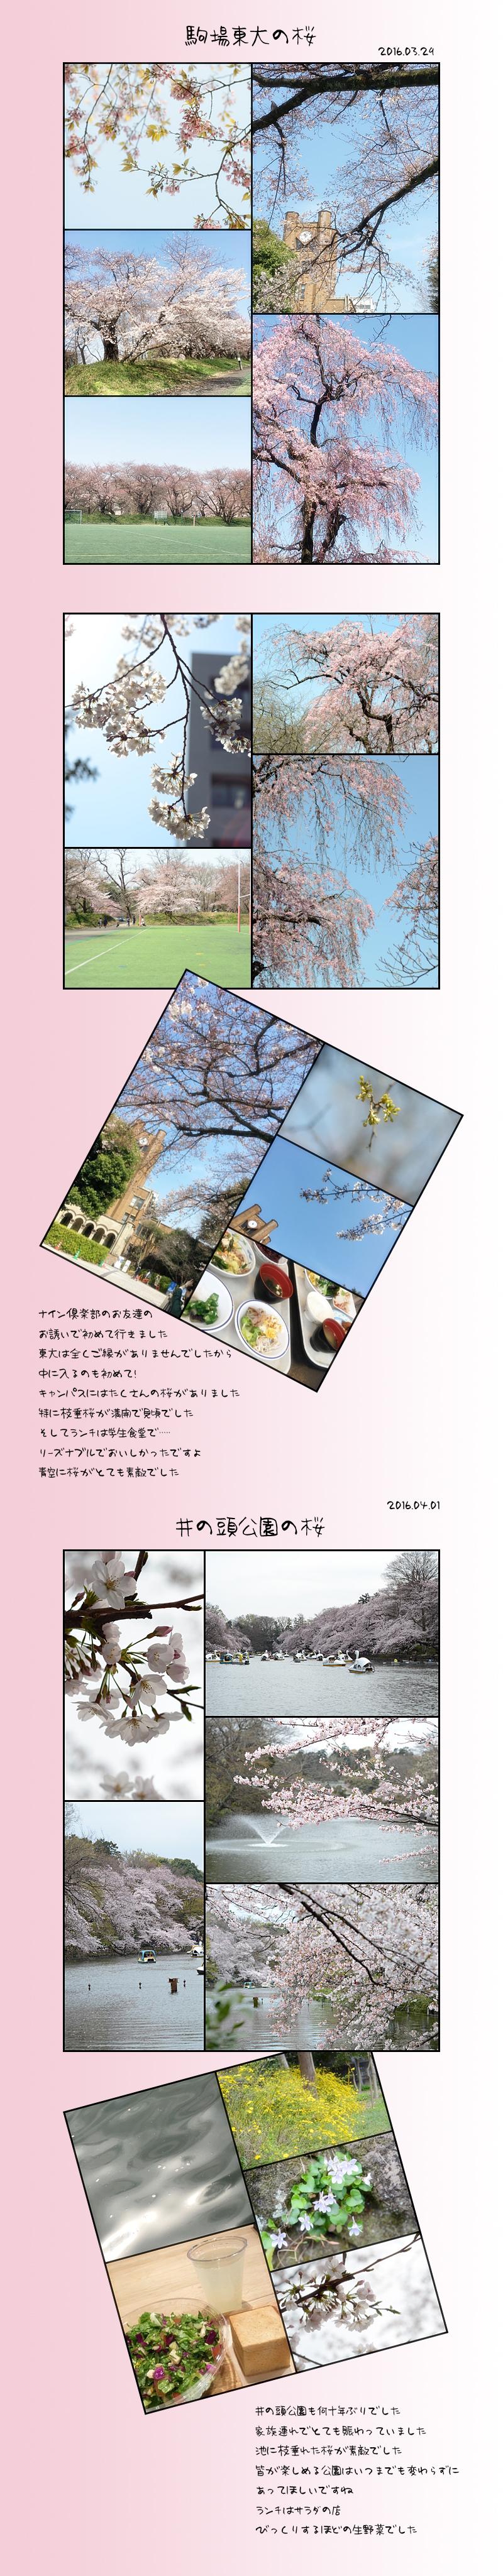 4月25日桜2